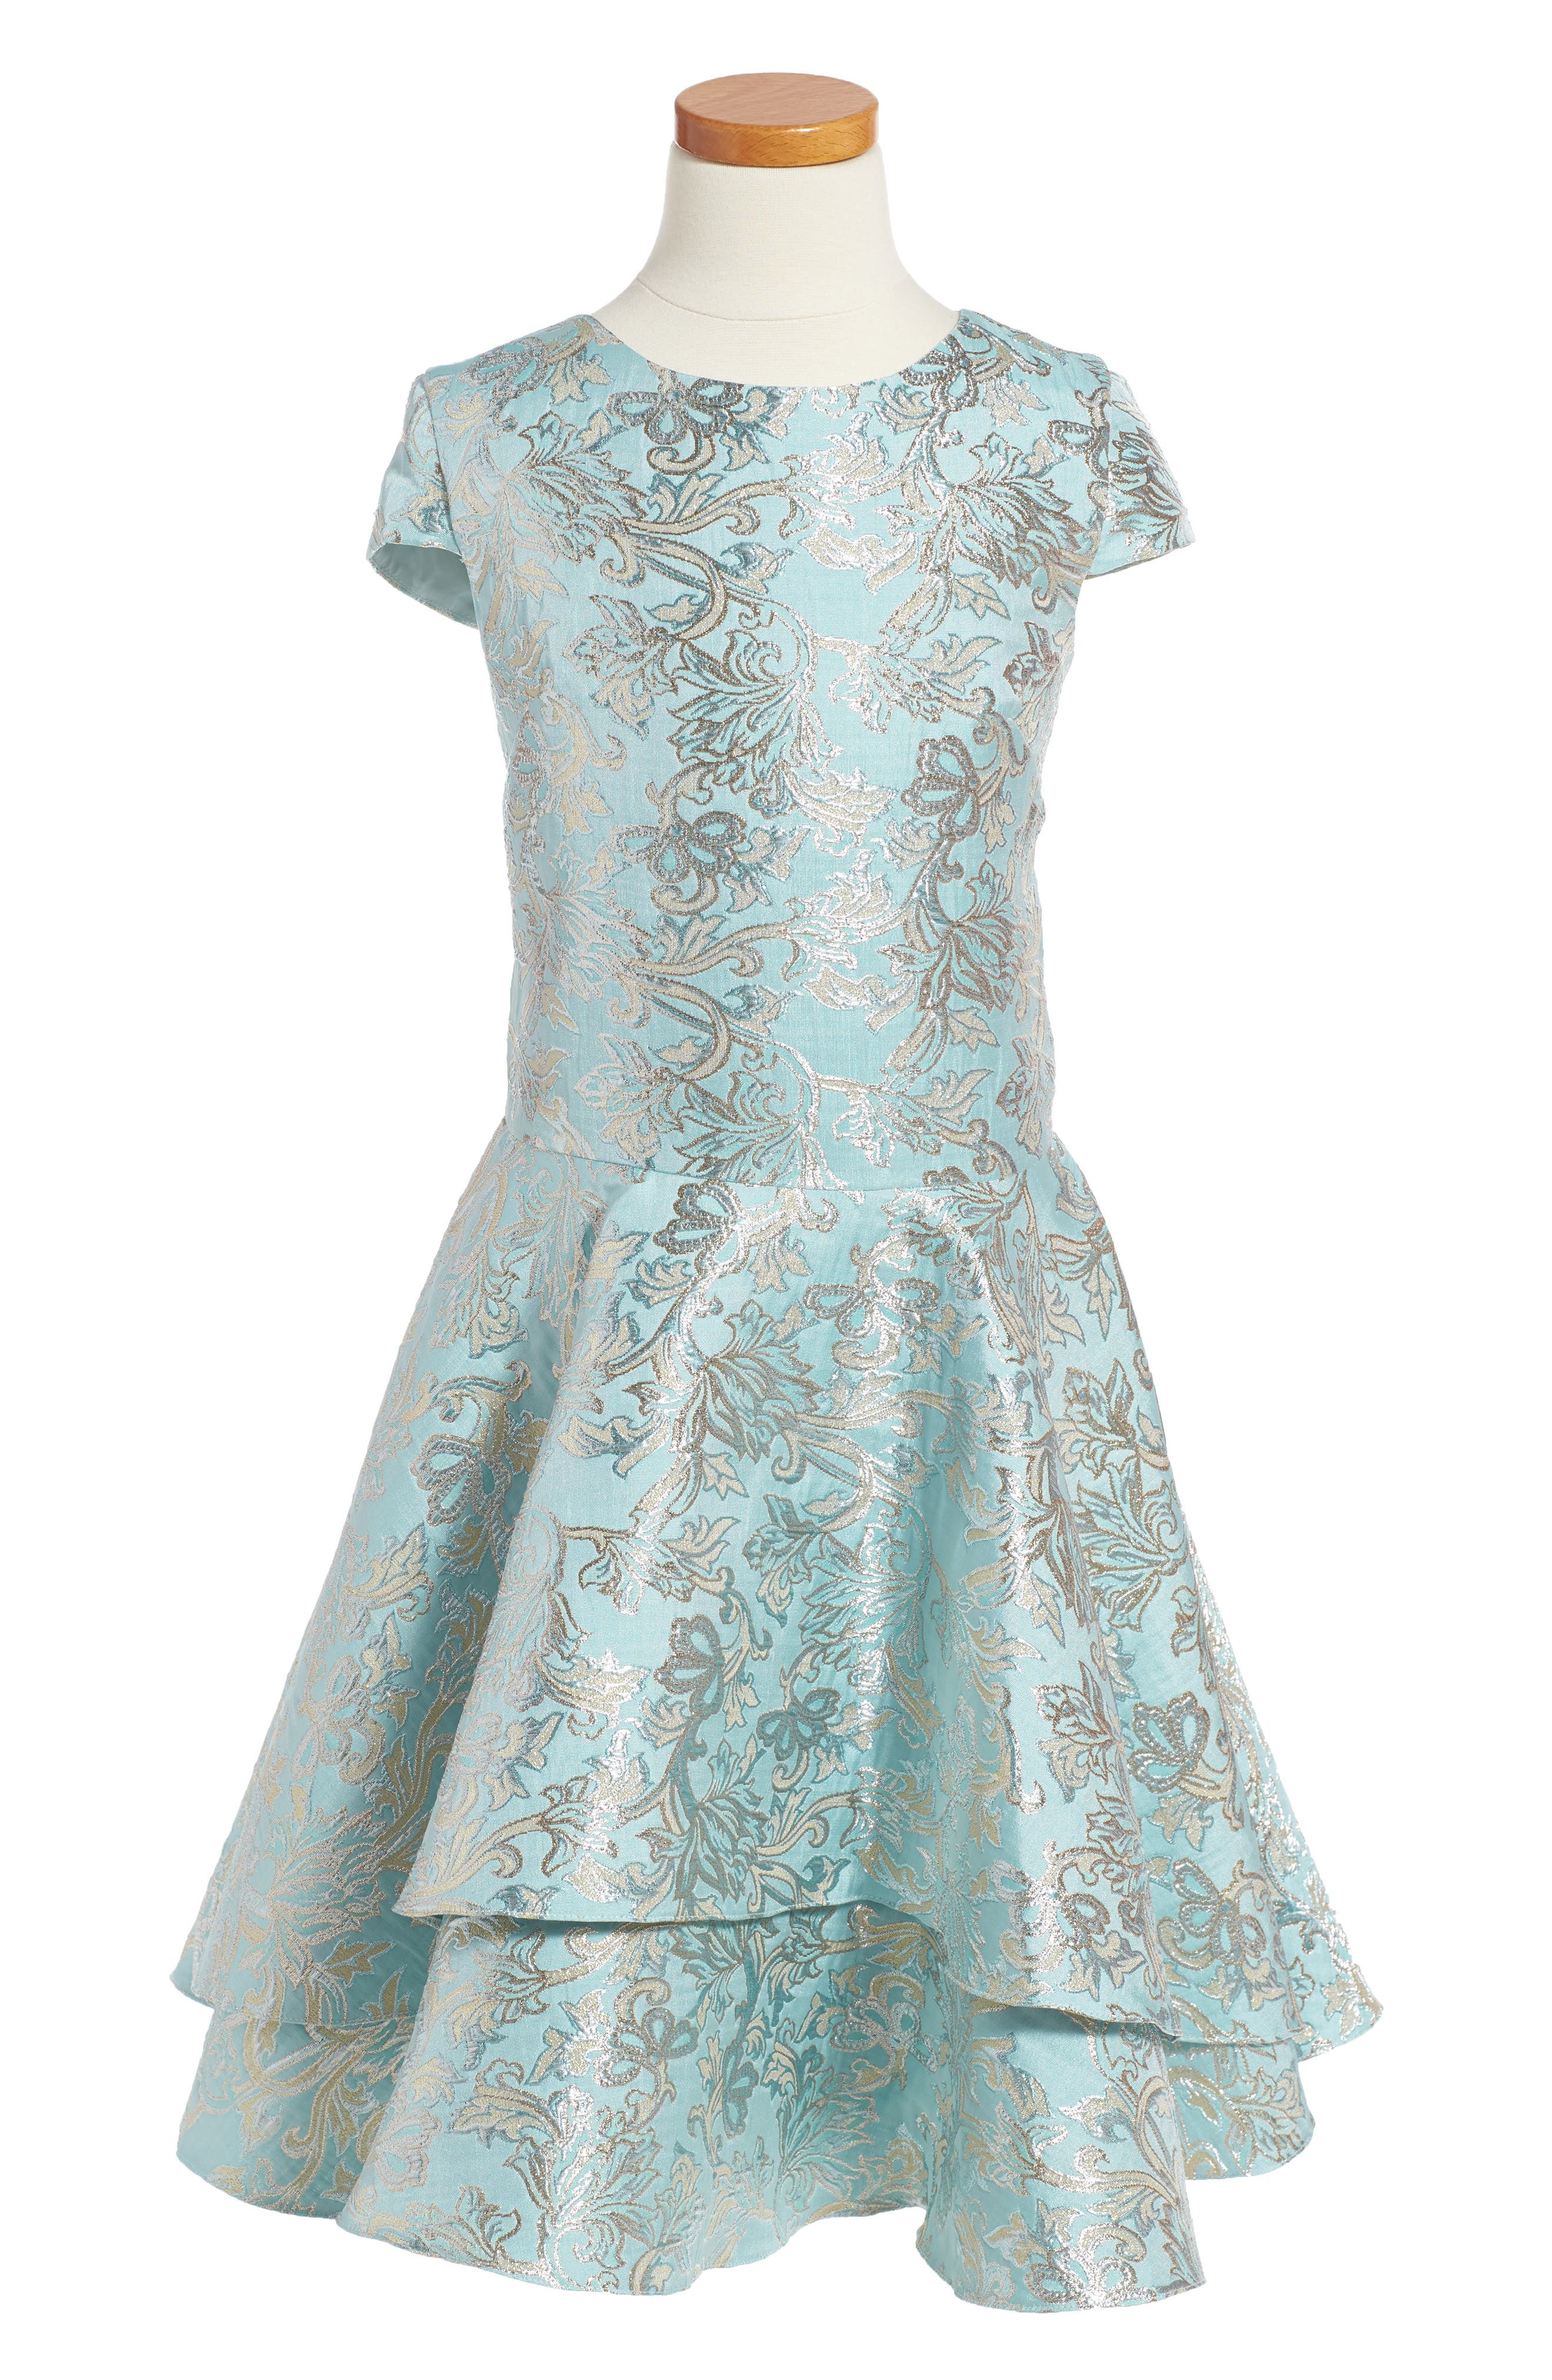 Main Image - David Charles Floral Brocade Dress (Big Girls)